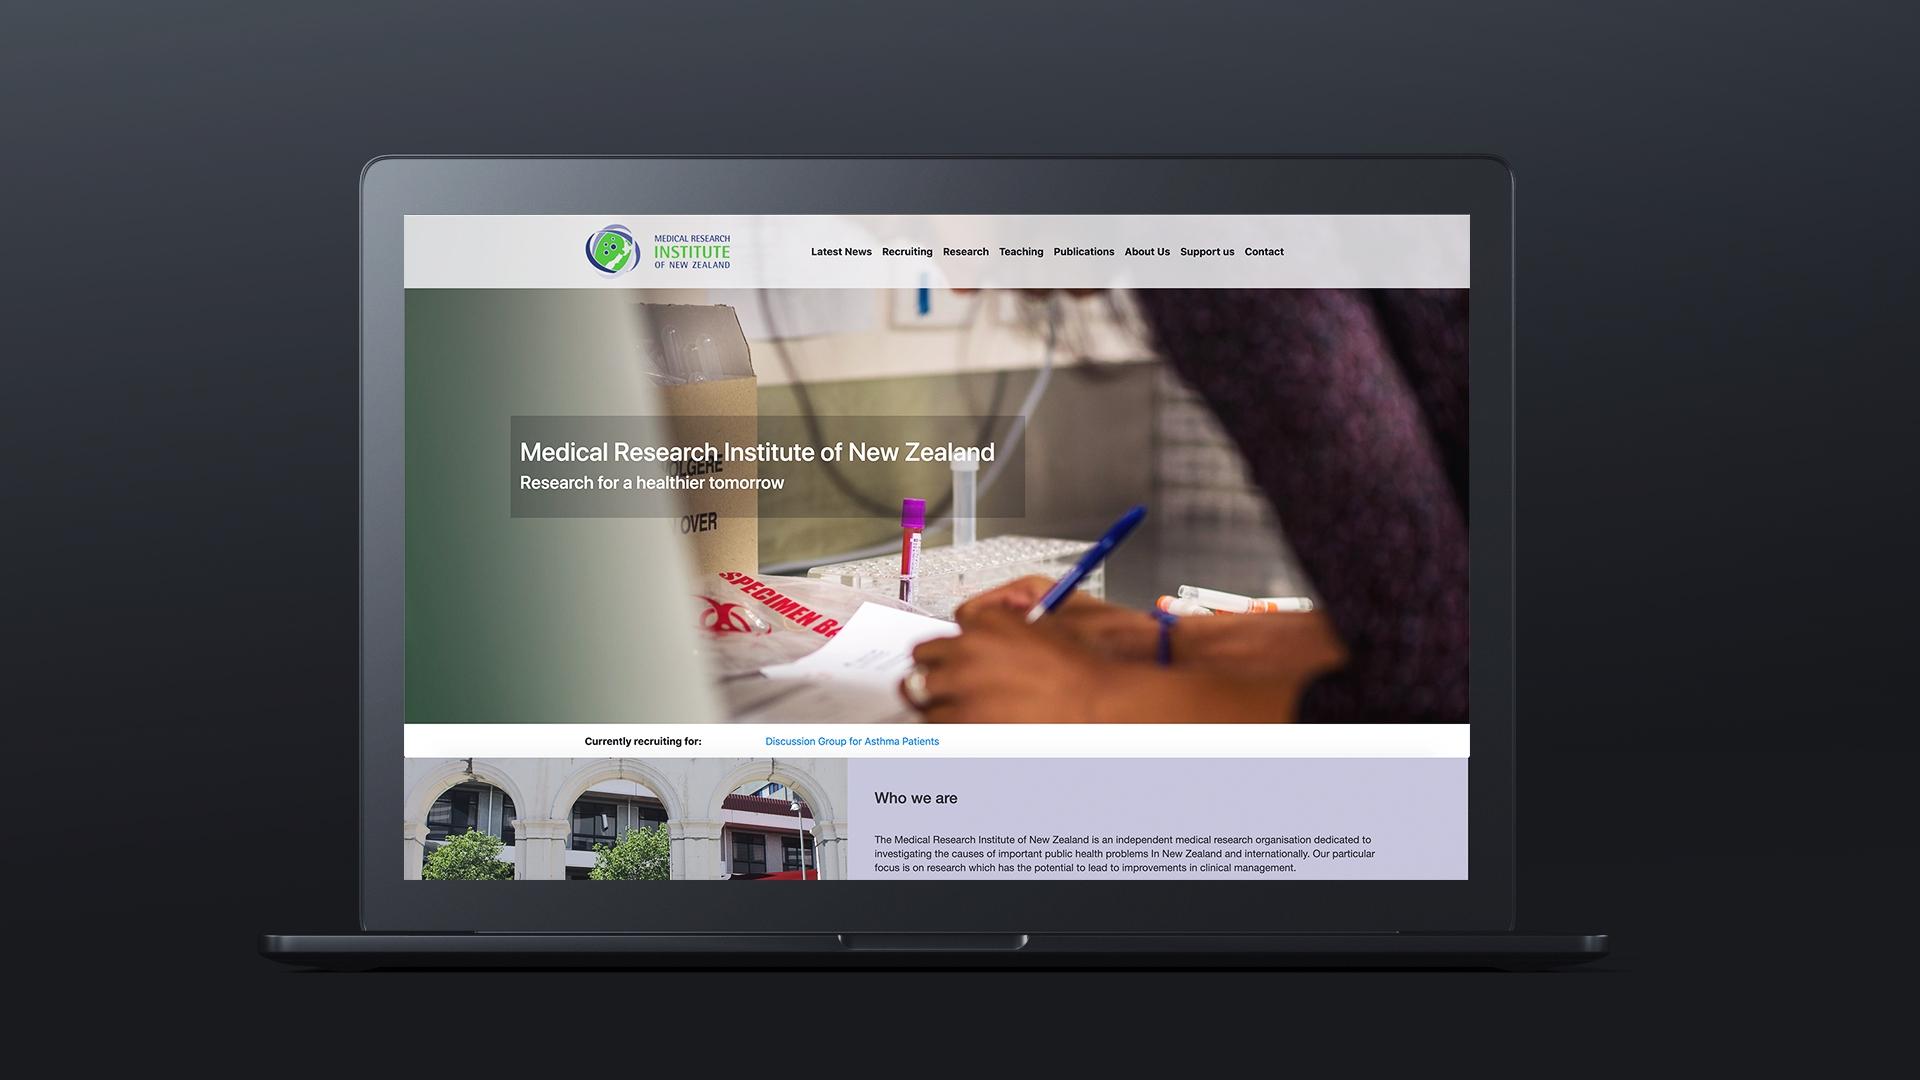 Medical Research Institute of New Zealand - Web Developer